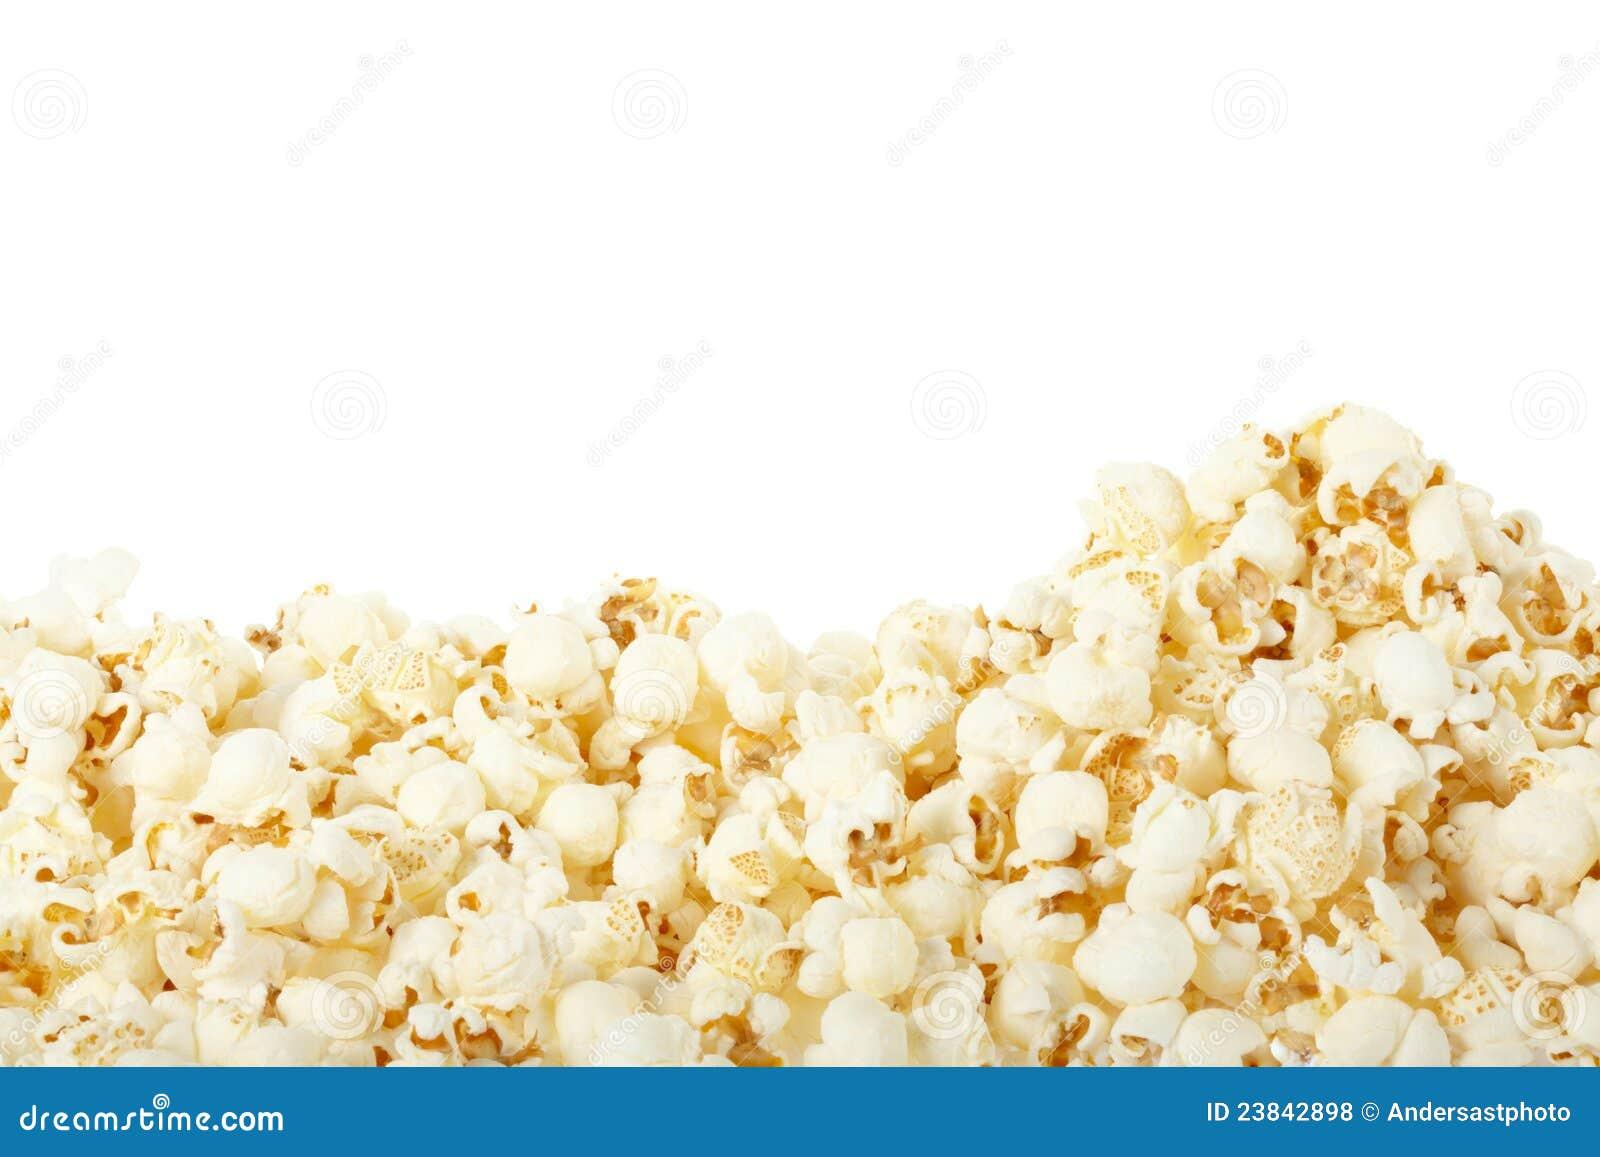 popcorn border royalty free stock photos image 23842898